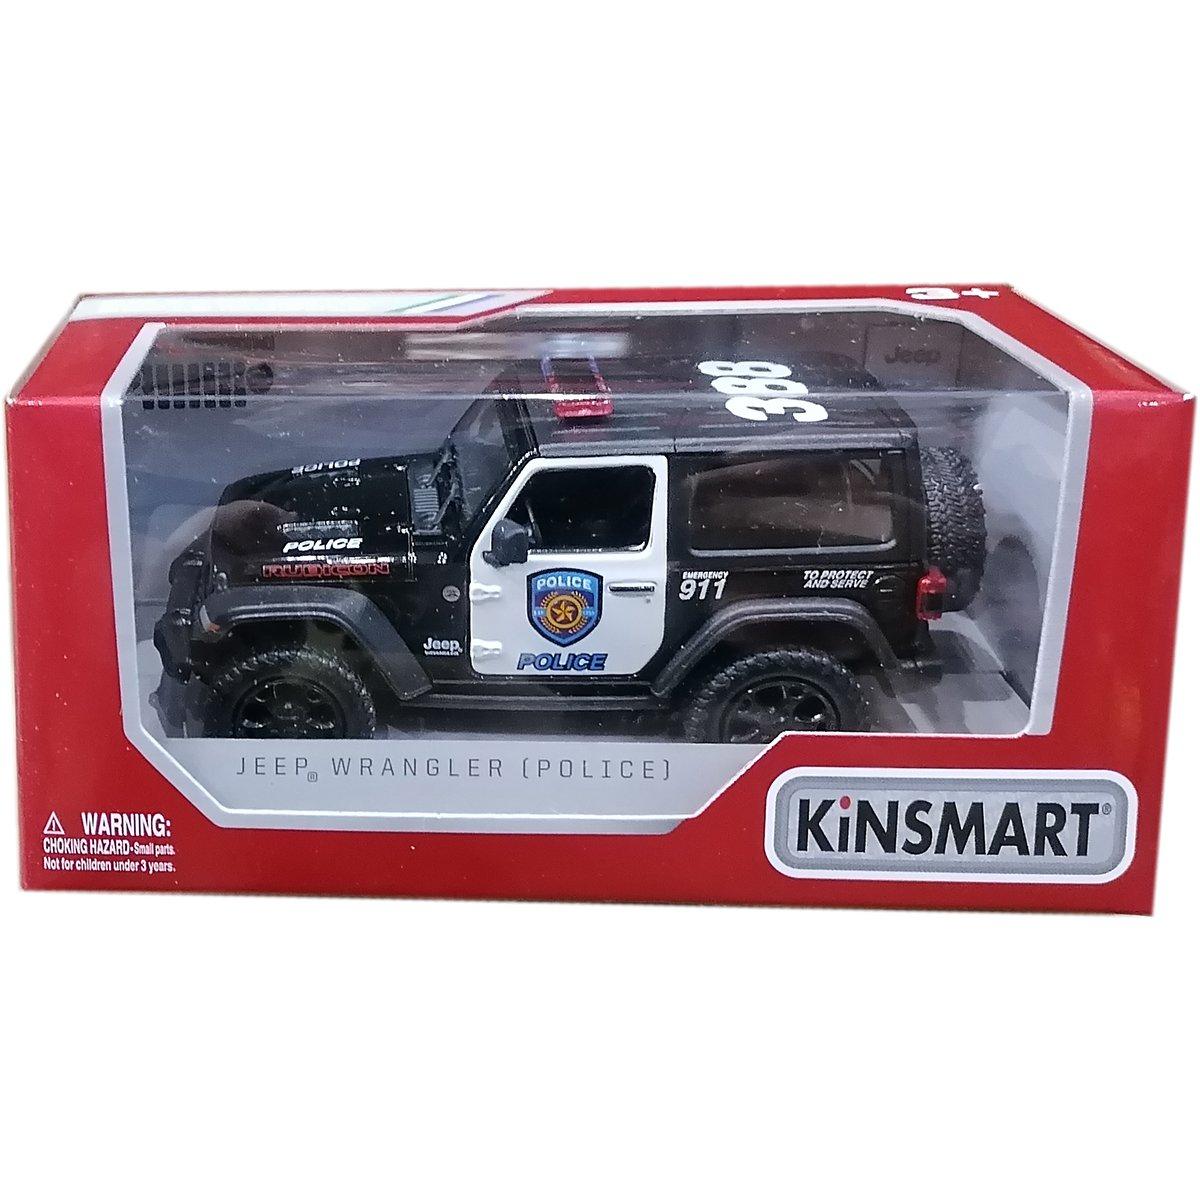 Masinuta metalica de politie Kinsmart, Jeep Wrangler